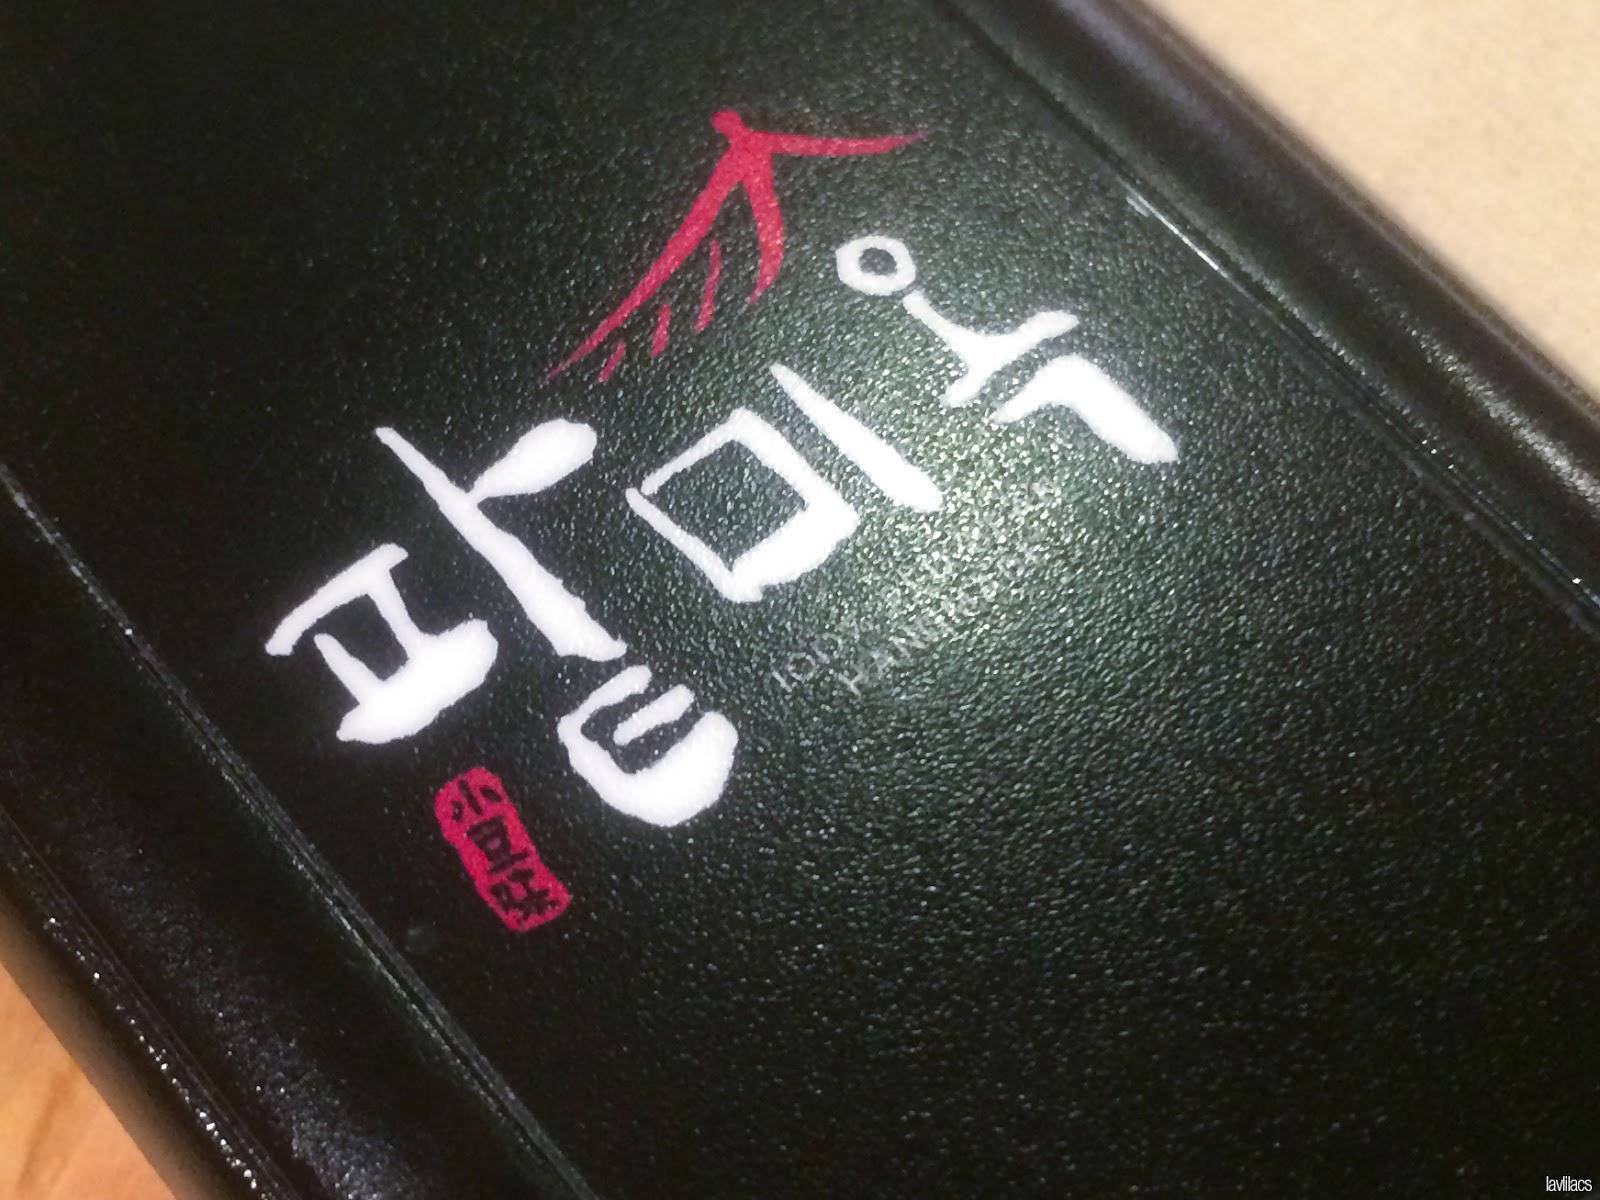 Seoul, Korea - Summer Study Abroad 2014 - Patmiok 小豆味 팥미옥 - Favorite bingsoo chain